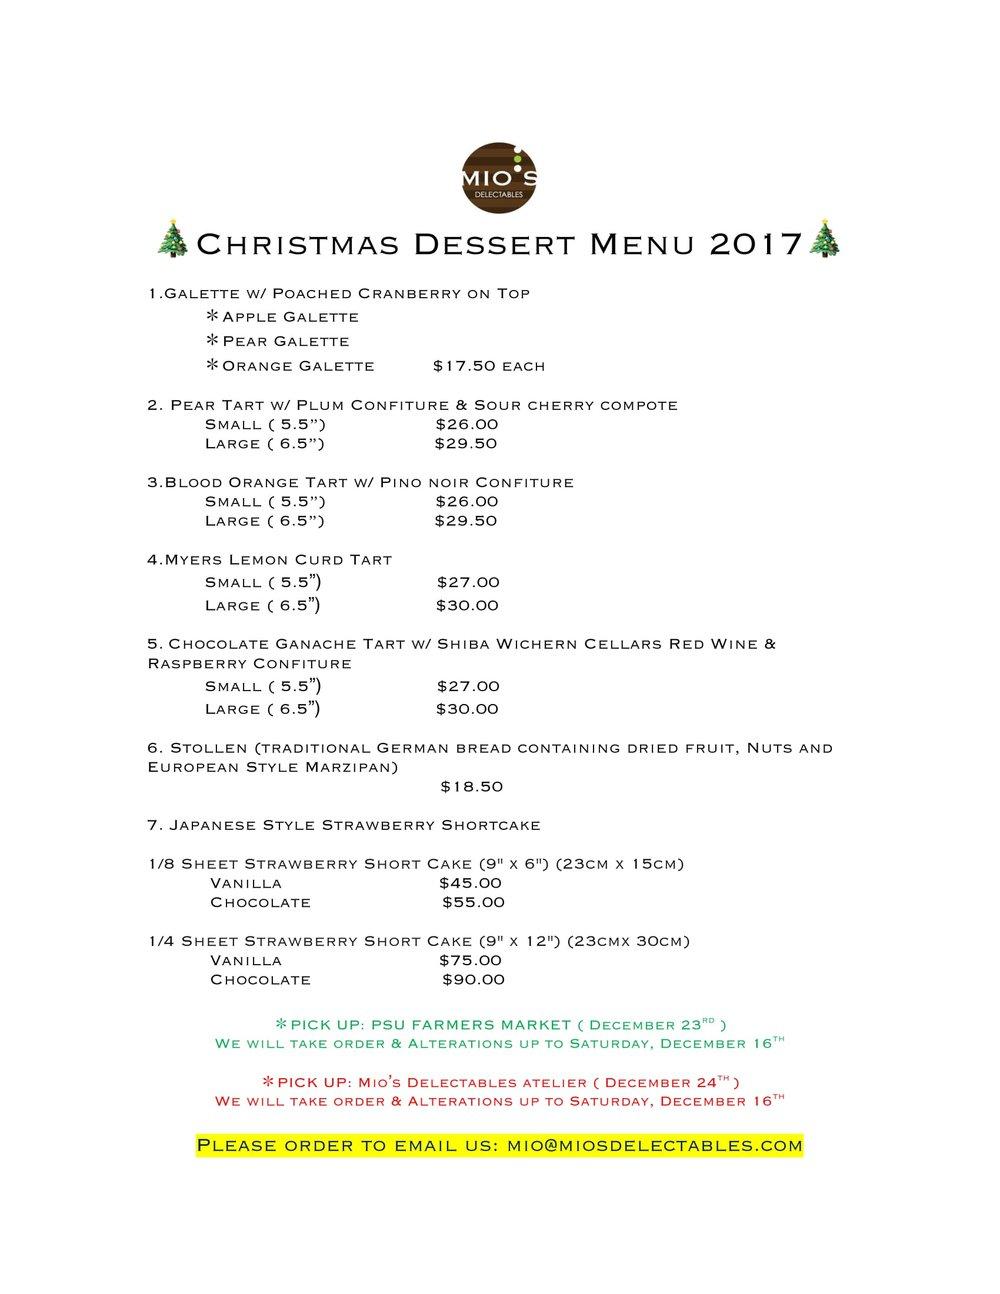 Mio's Delectables 2017 Christmas Dessert Menu-1.jpg